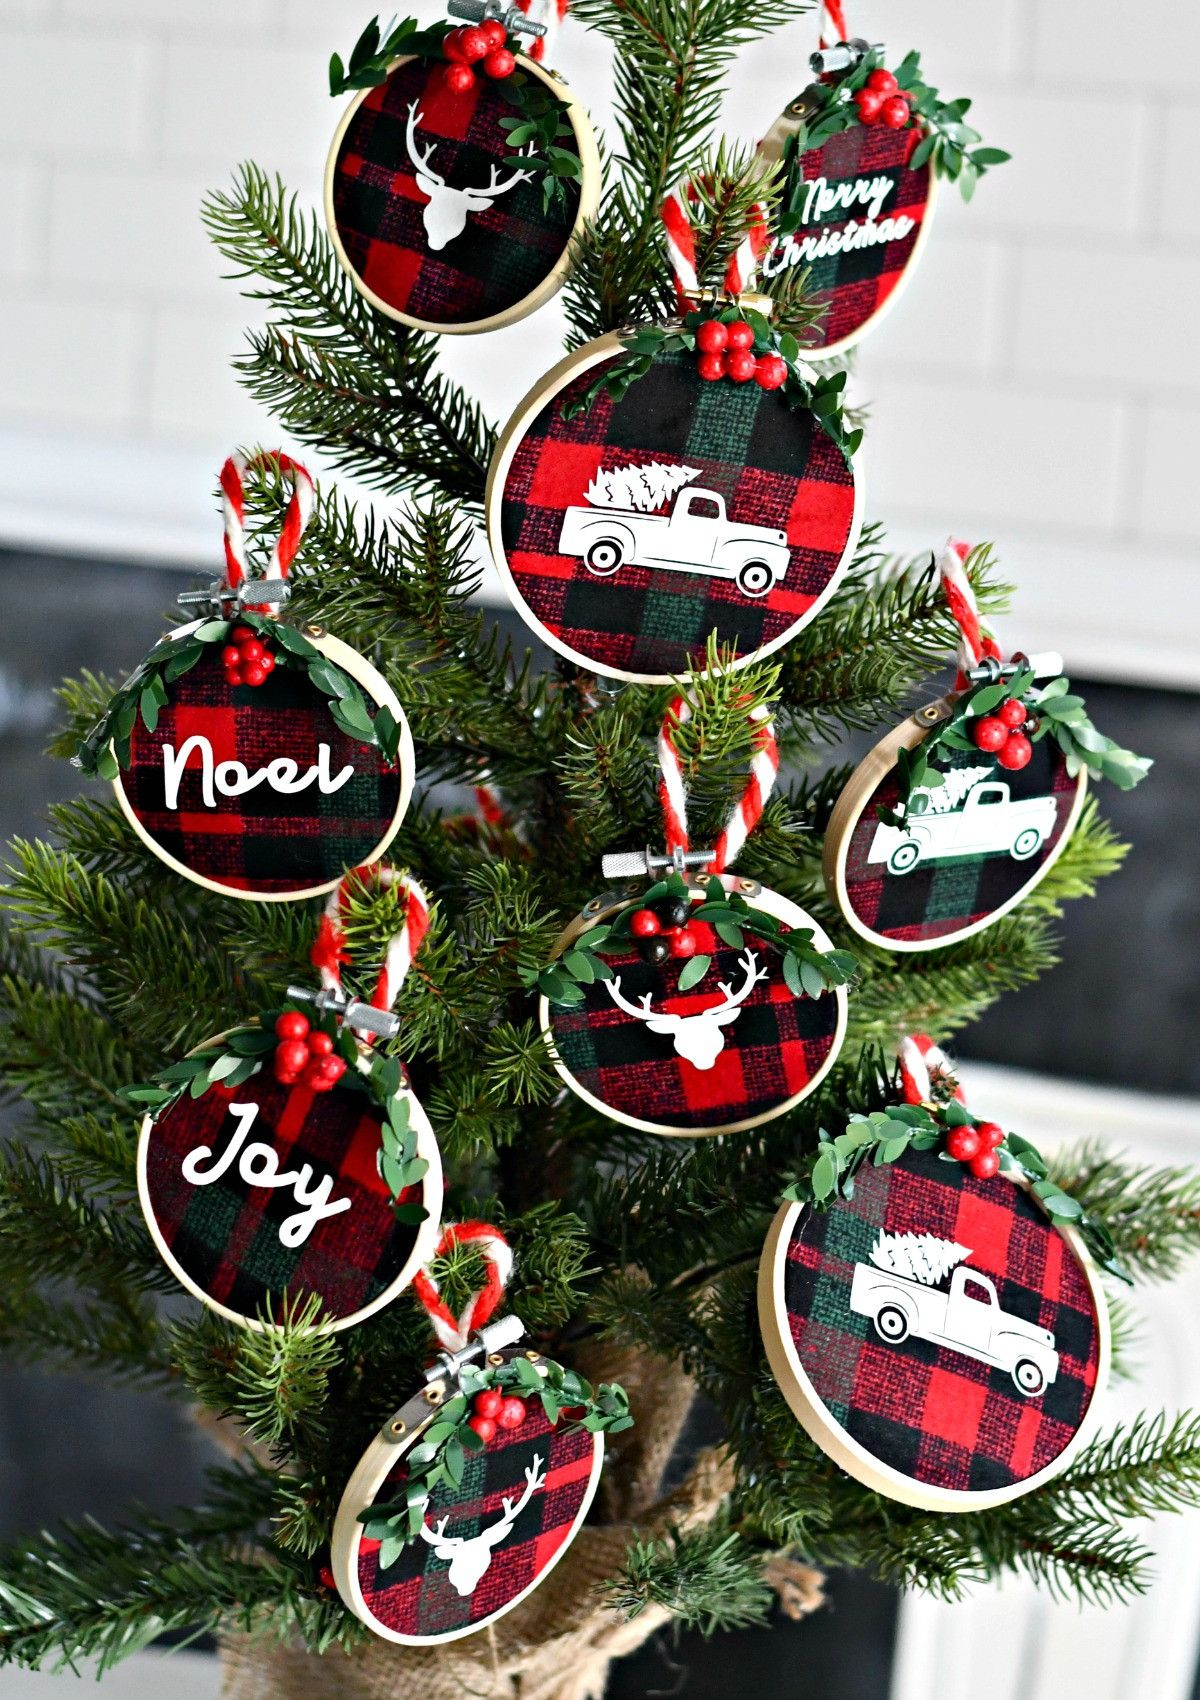 Diy Embroidery Hoop Christmas Ornaments A Small Tree Decorated With The Ornaments Christmas Ornaments Homemade Christmas Ornaments Diy Christmas Ornaments